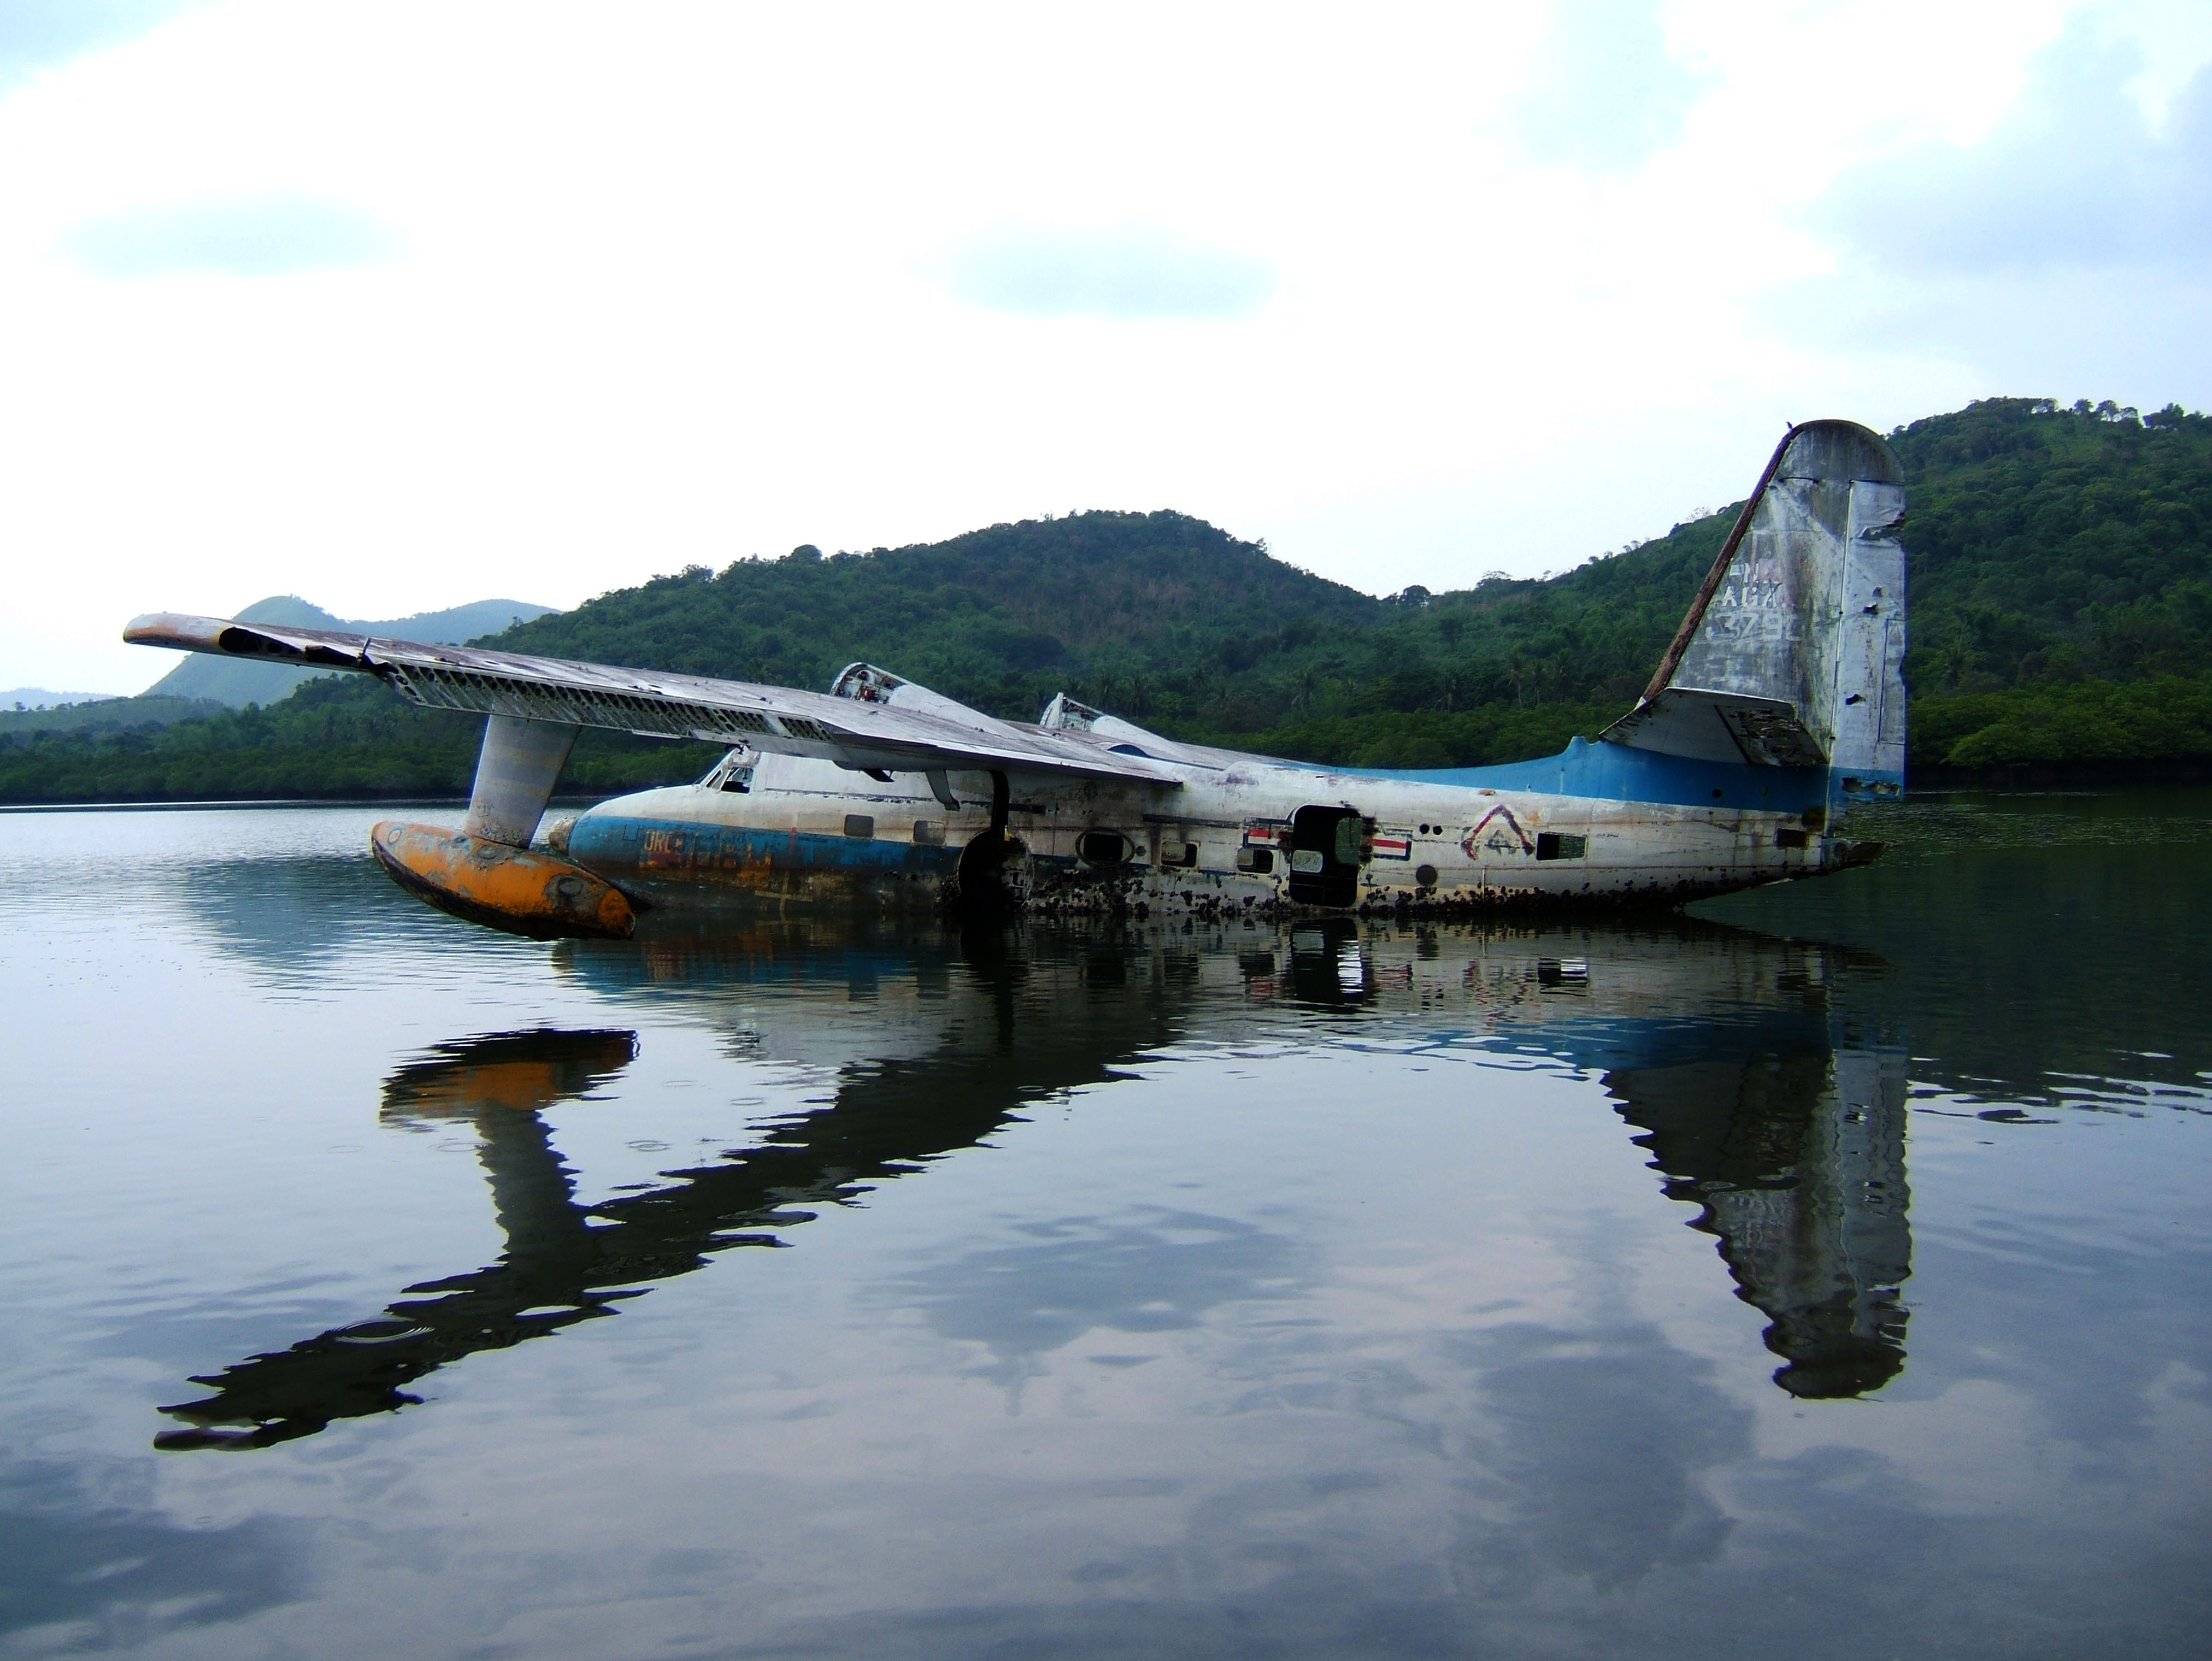 USN Bul No 137906 UF 1 Albatross Philippine AF Coron Bay July 2005 03